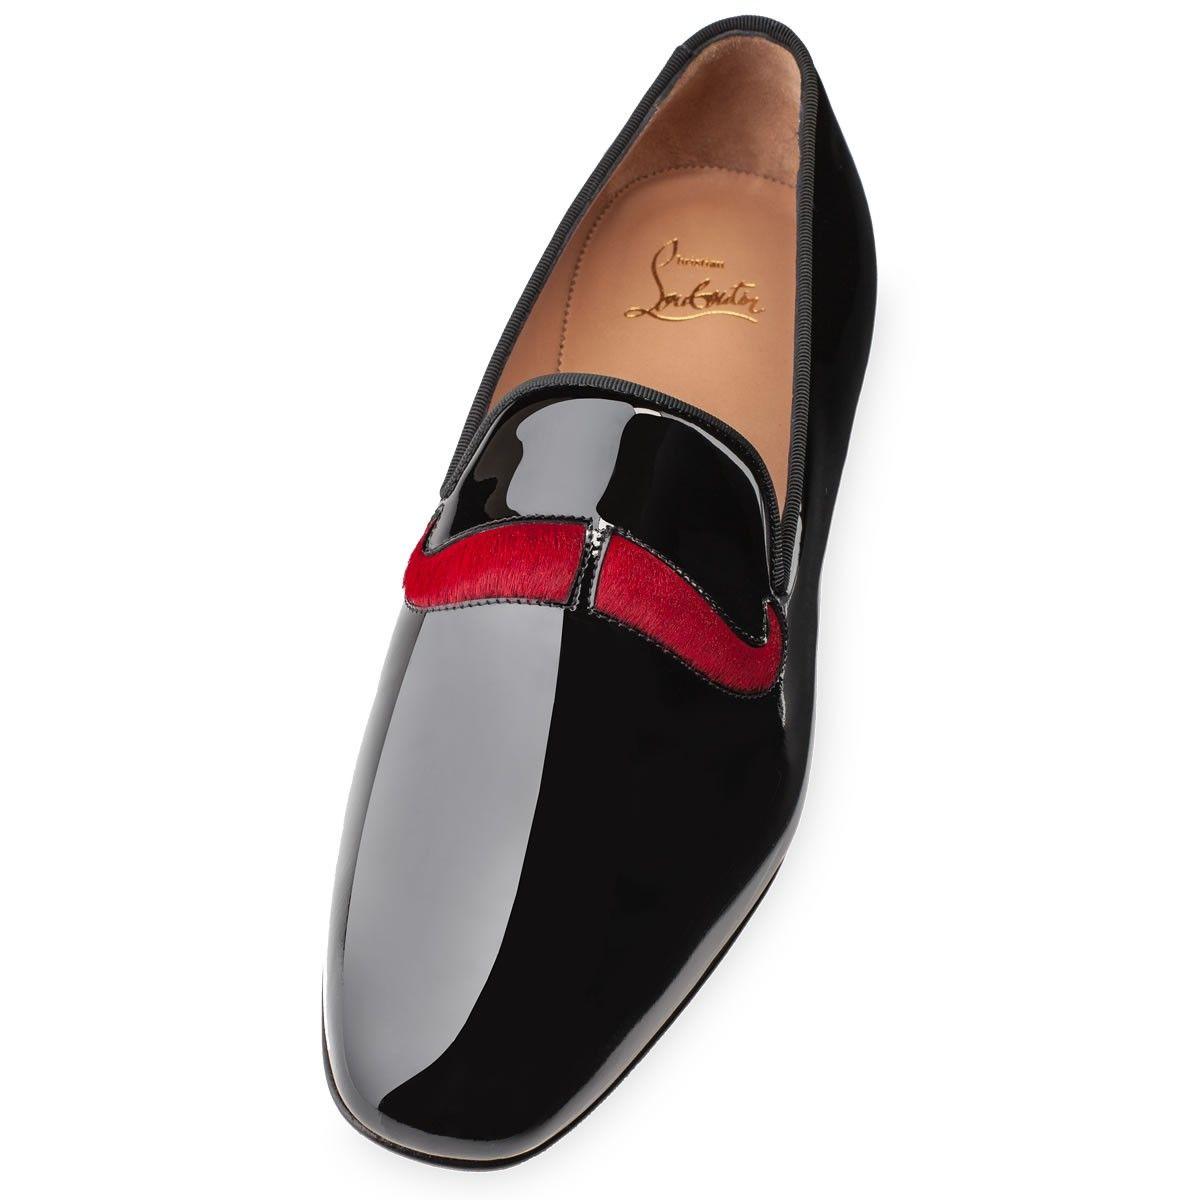 22b802e617b WATSON FLAT VERNIS/PONY , BLACK/RED, Pony, Men Shoes | Shose ...